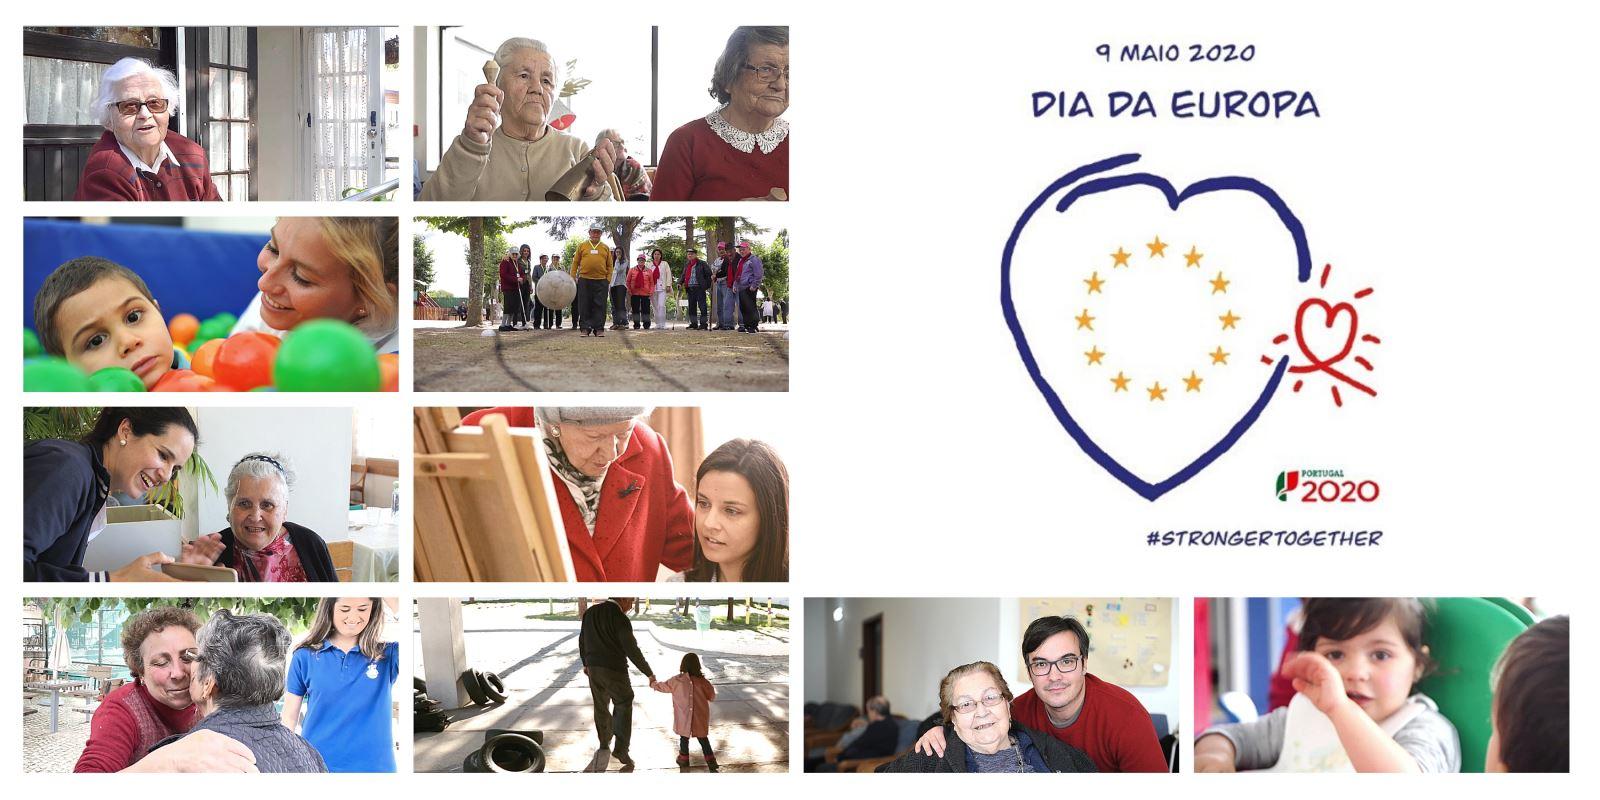 Dia da Europa | Contributo decisivo para as Misericórdias